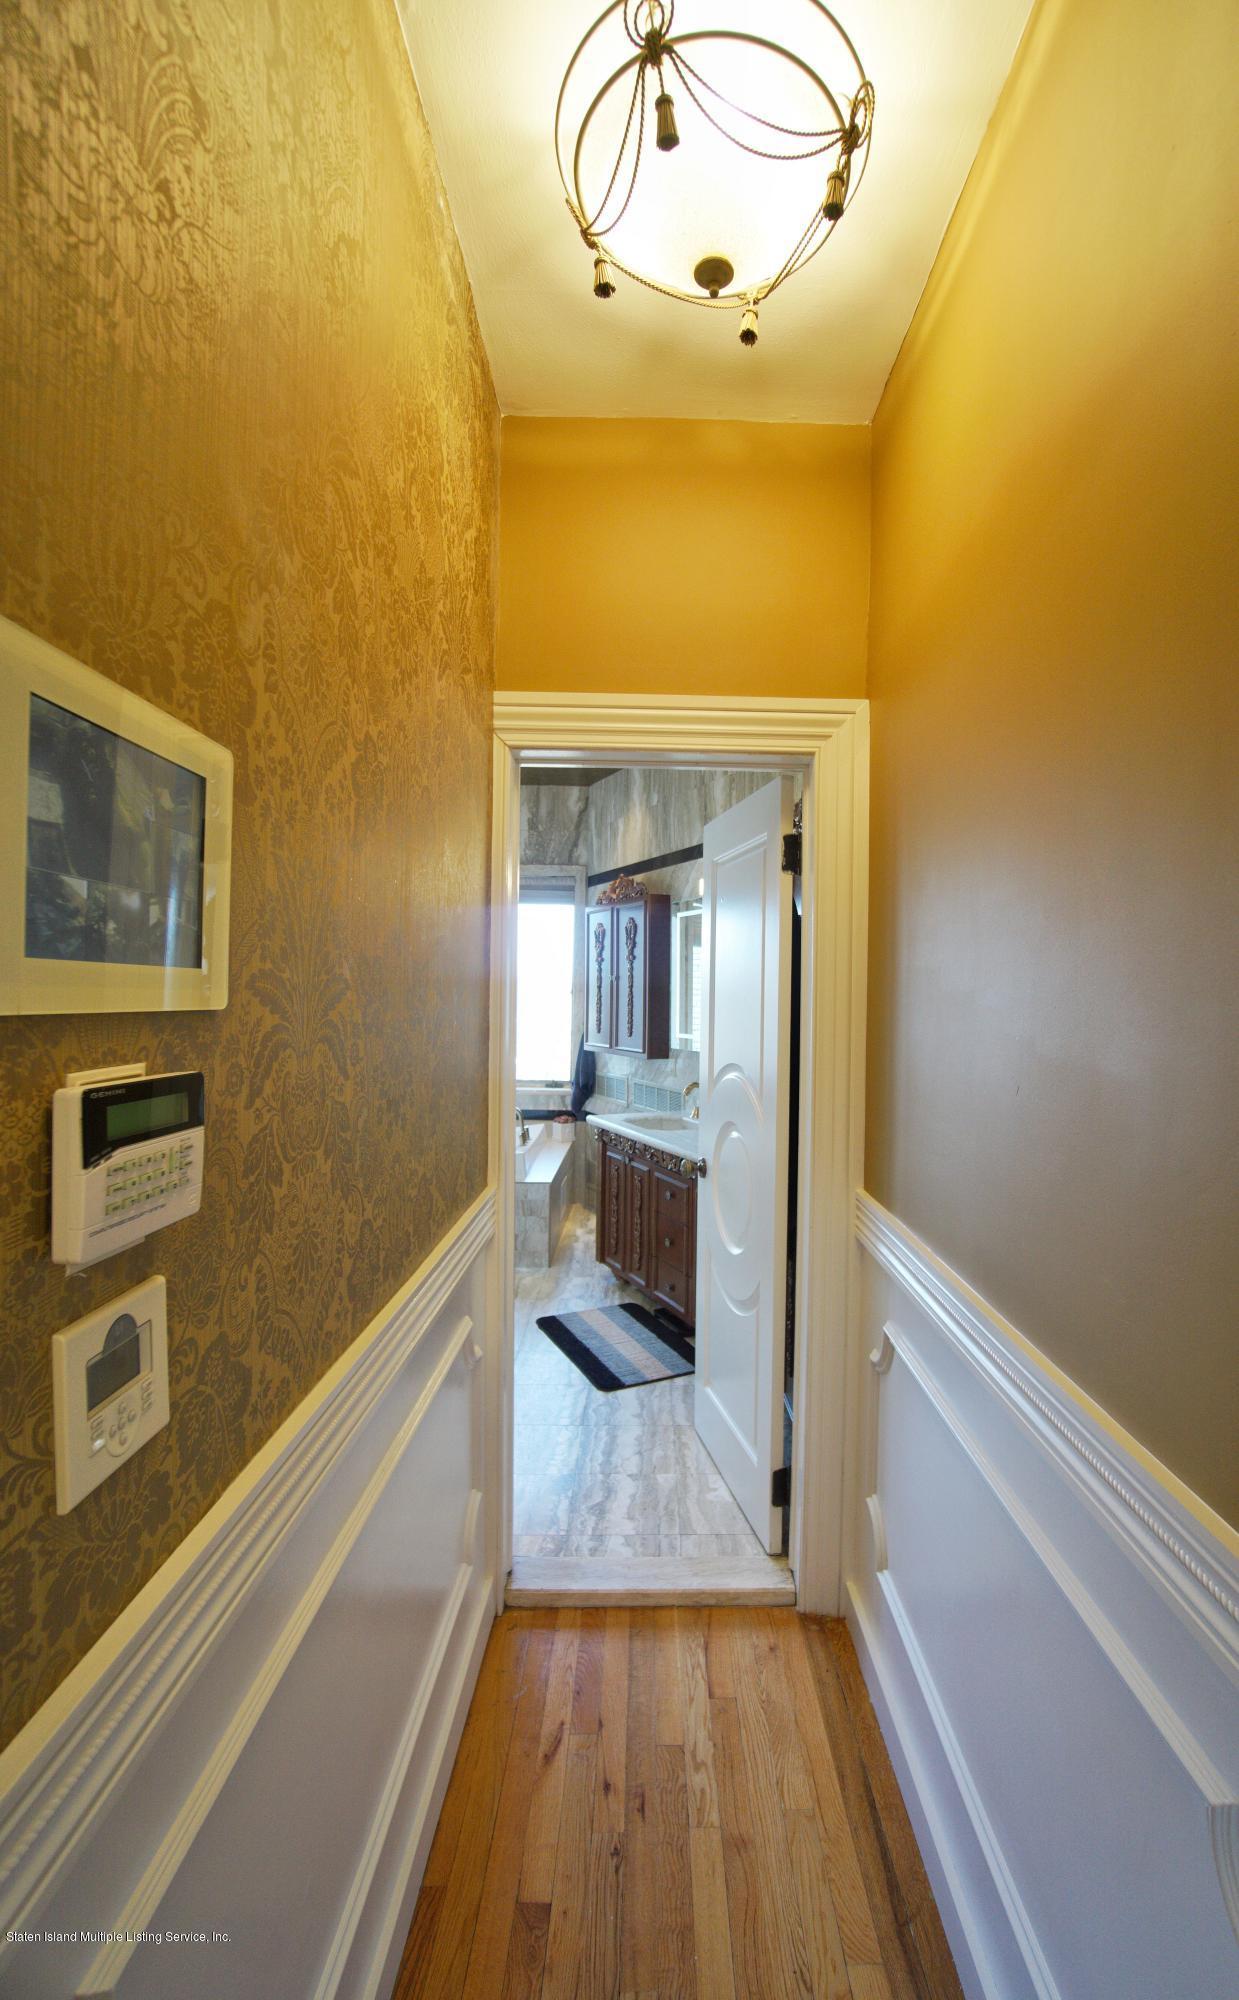 Single Family - Detached 31 Seidman Avenue  Staten Island, NY 10312, MLS-1136904-37